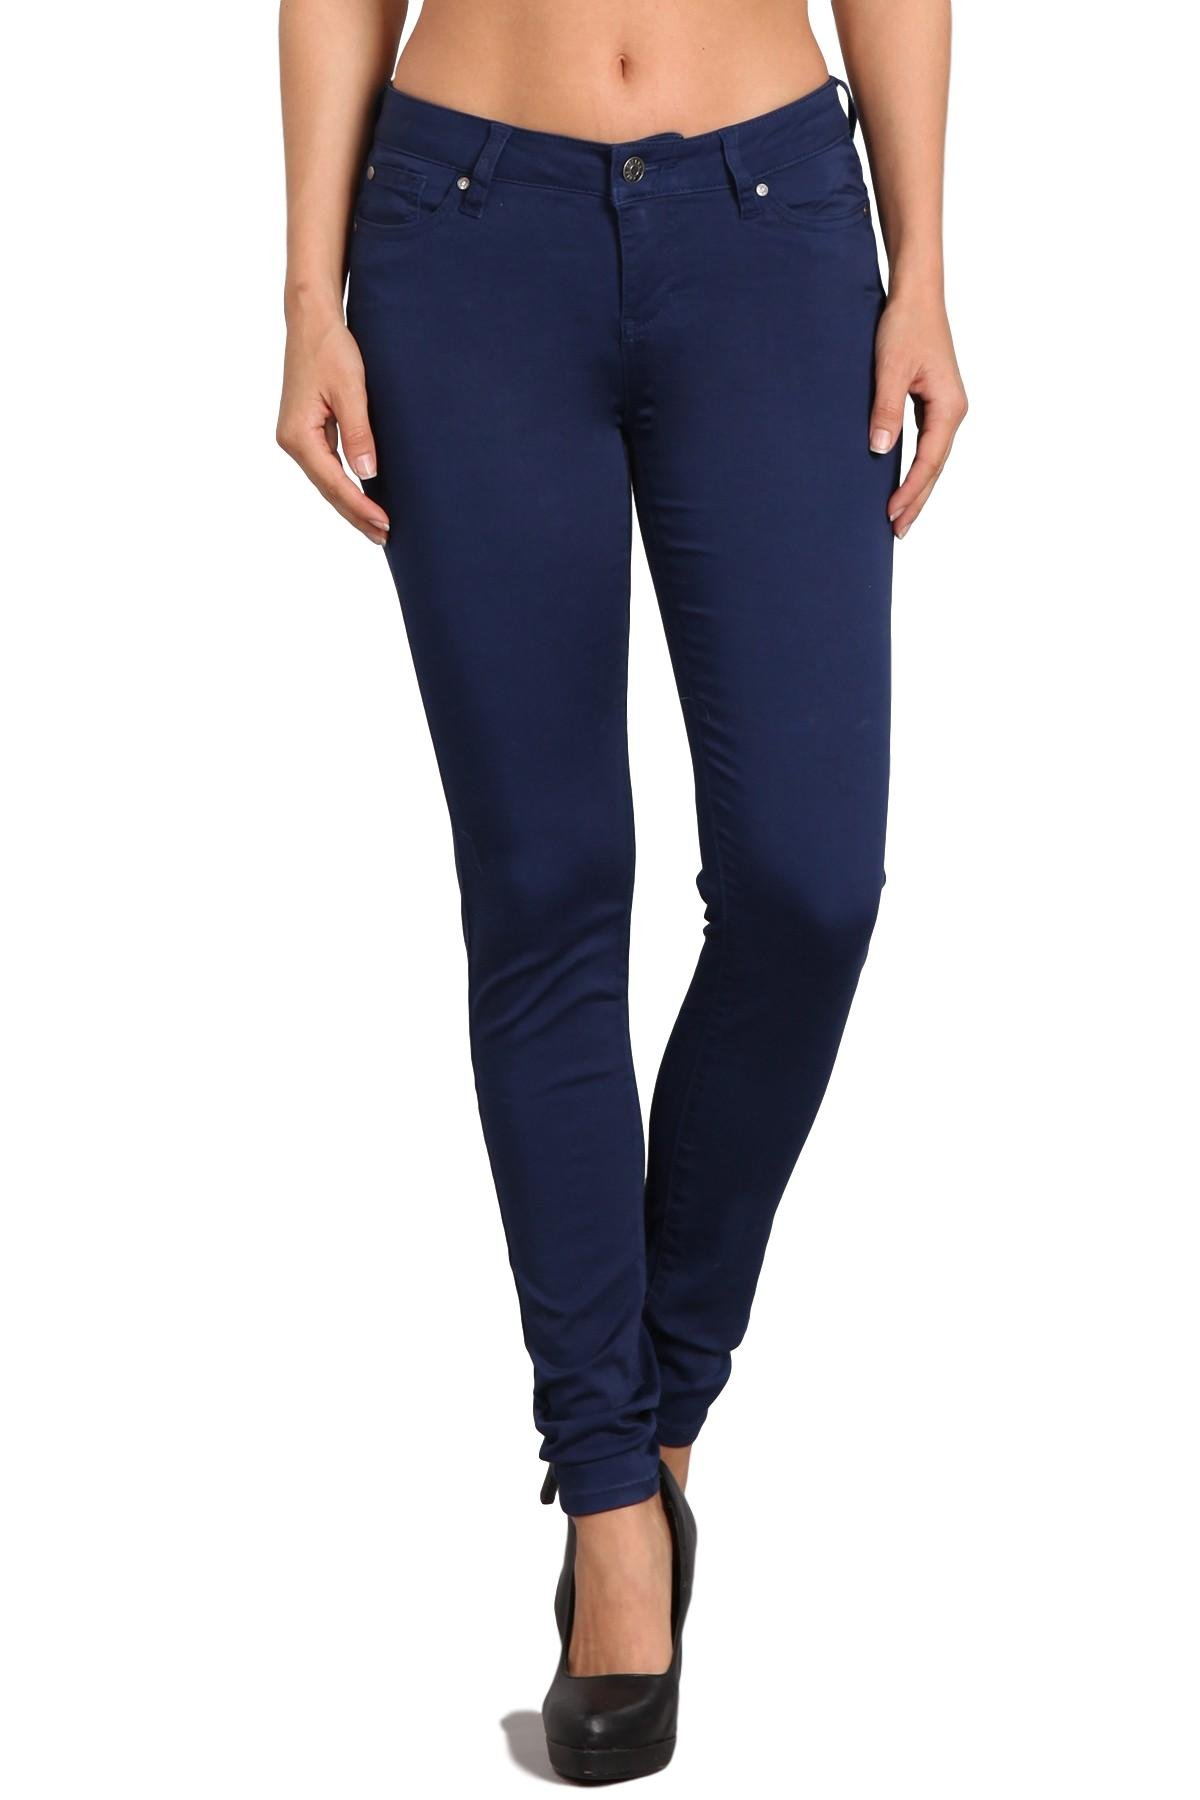 Celebrity Pink Women's Mid Rise Colored Skinny Pants CJ21038Z35 (Medeival Blue, 7/28)